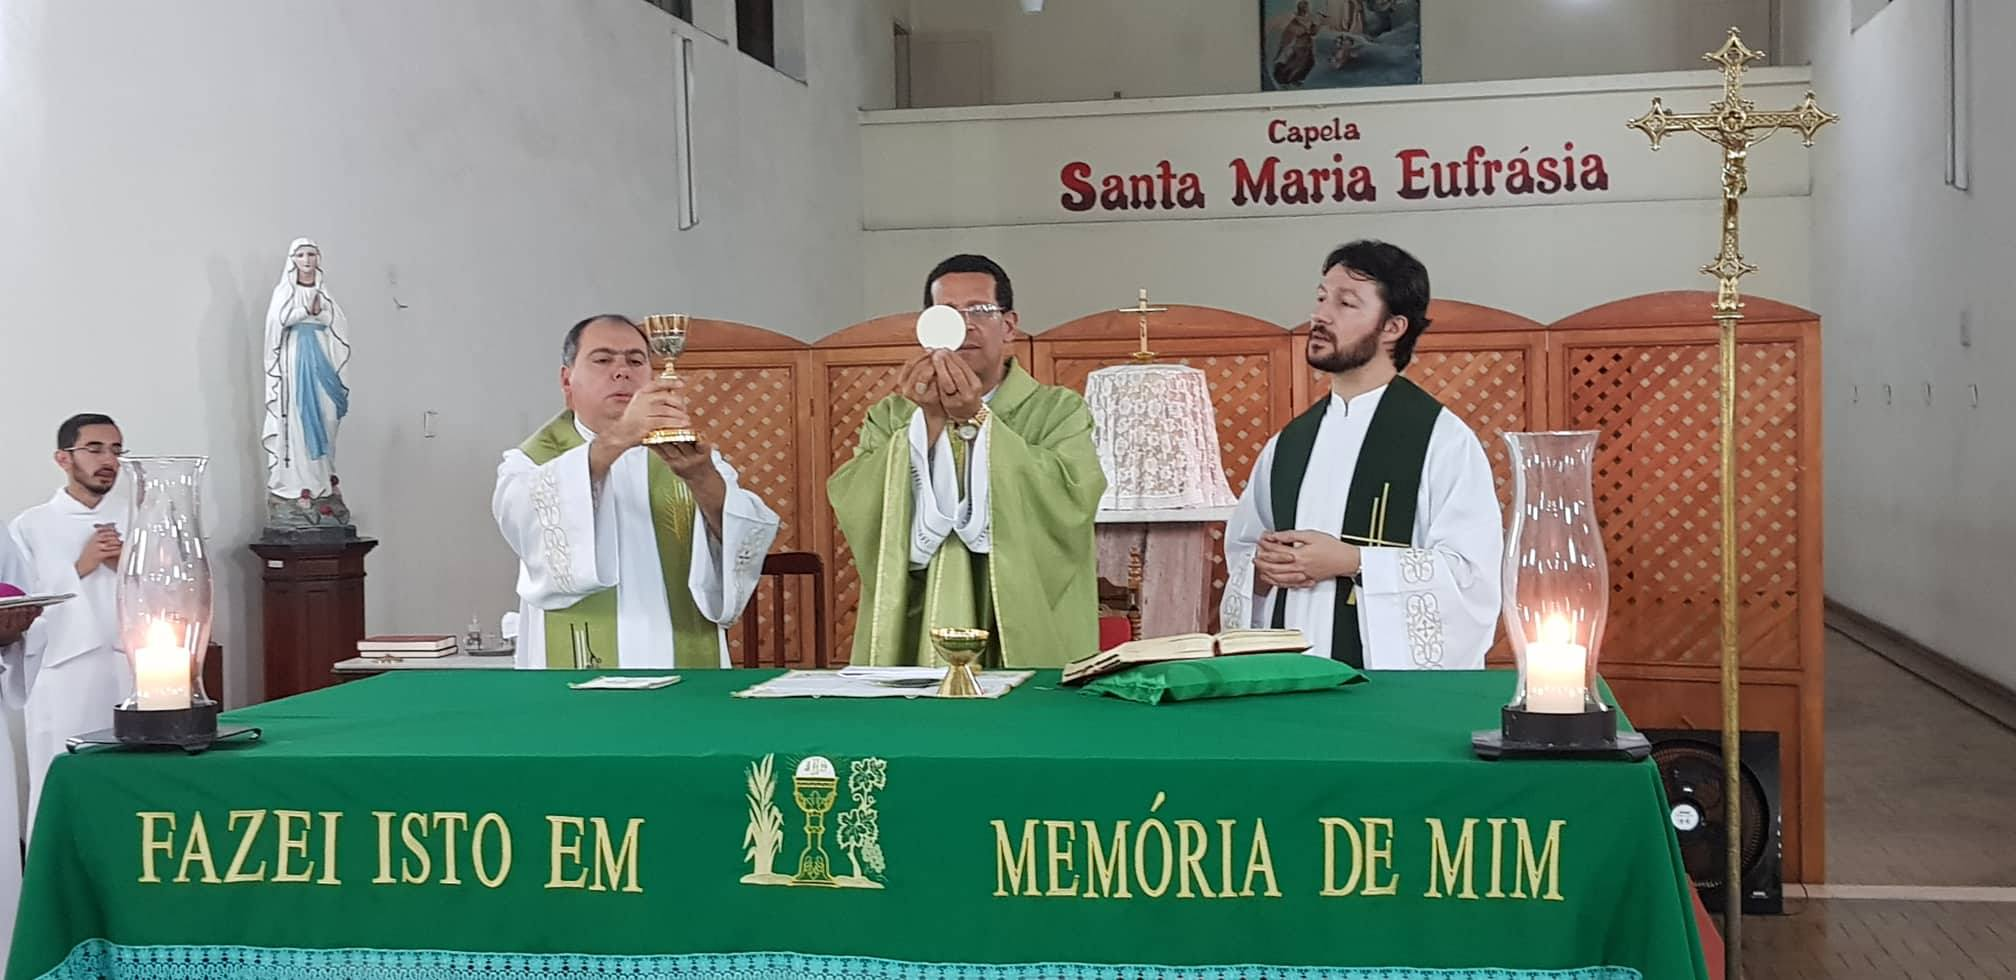 Seminarista Márcio Júnior é admitido às ordens sacras